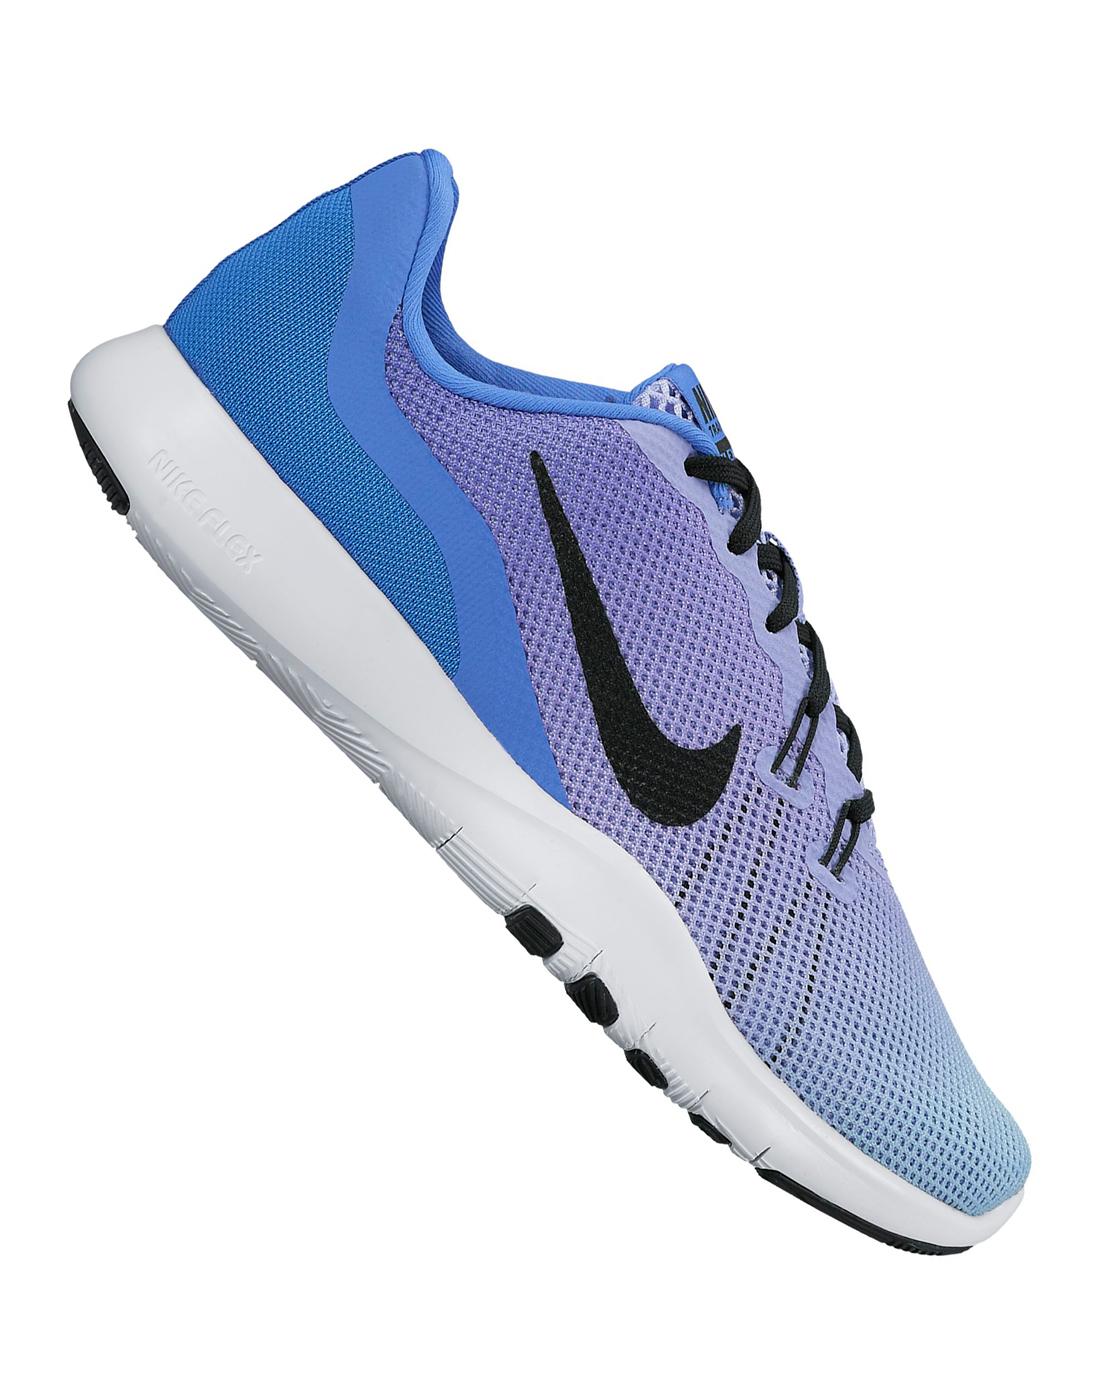 7567edcbde698 Nike Womens Flex Trainer 7 Fade